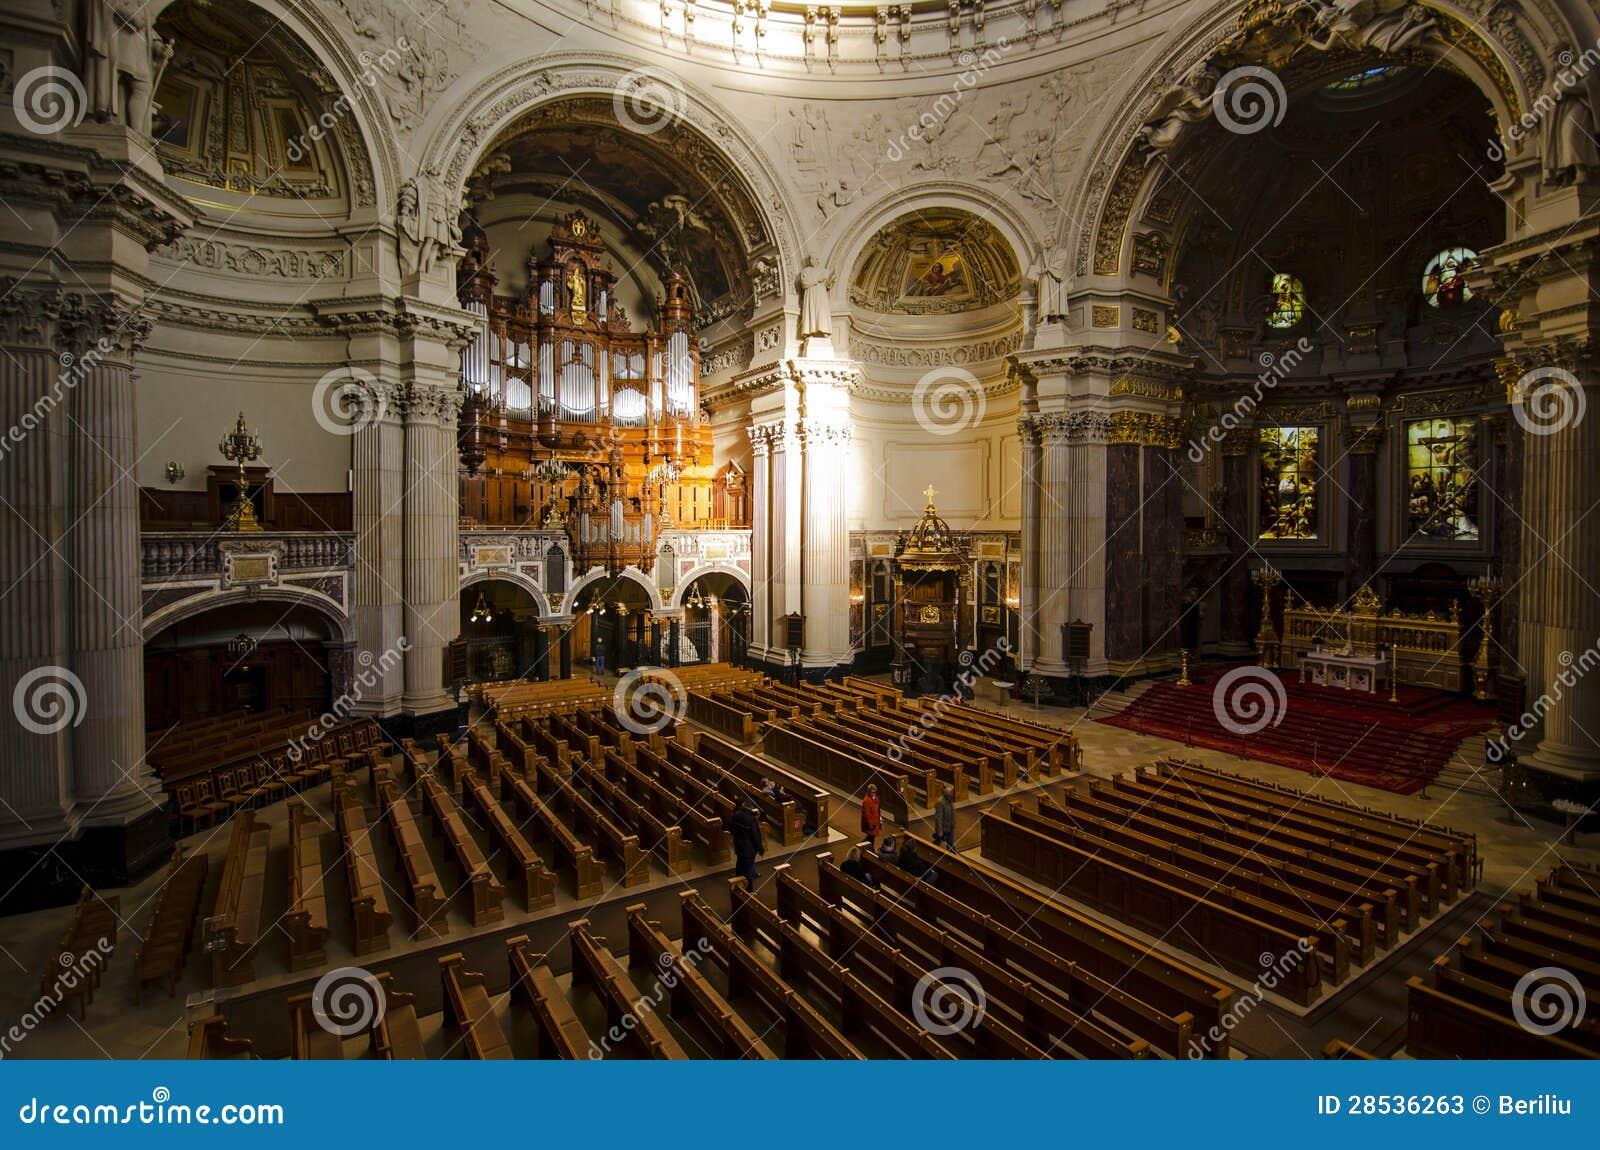 inside berlin cathedral stock image image of high berlin 28536263. Black Bedroom Furniture Sets. Home Design Ideas